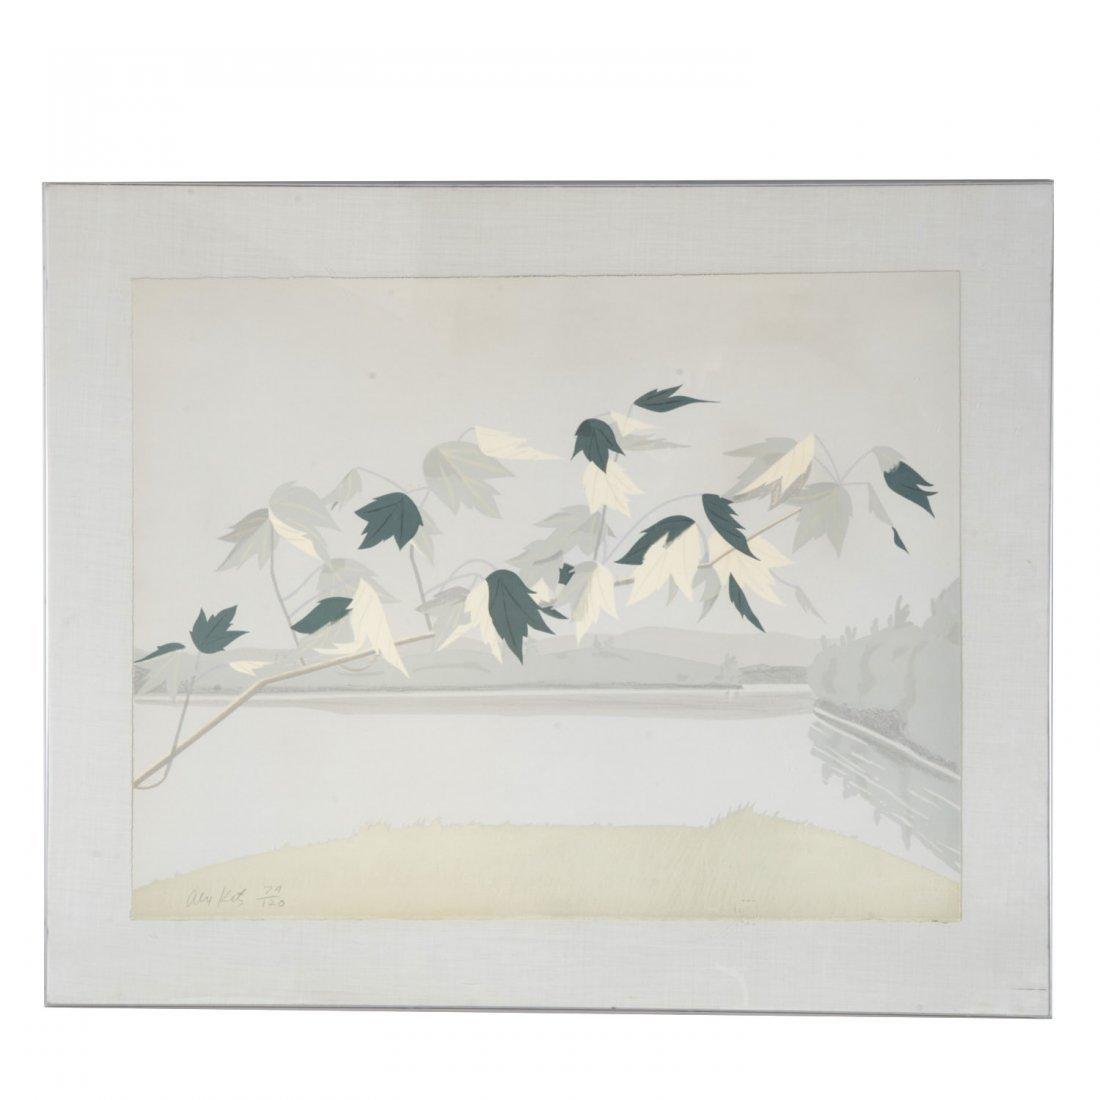 Alex Katz, limited ed. lithograph